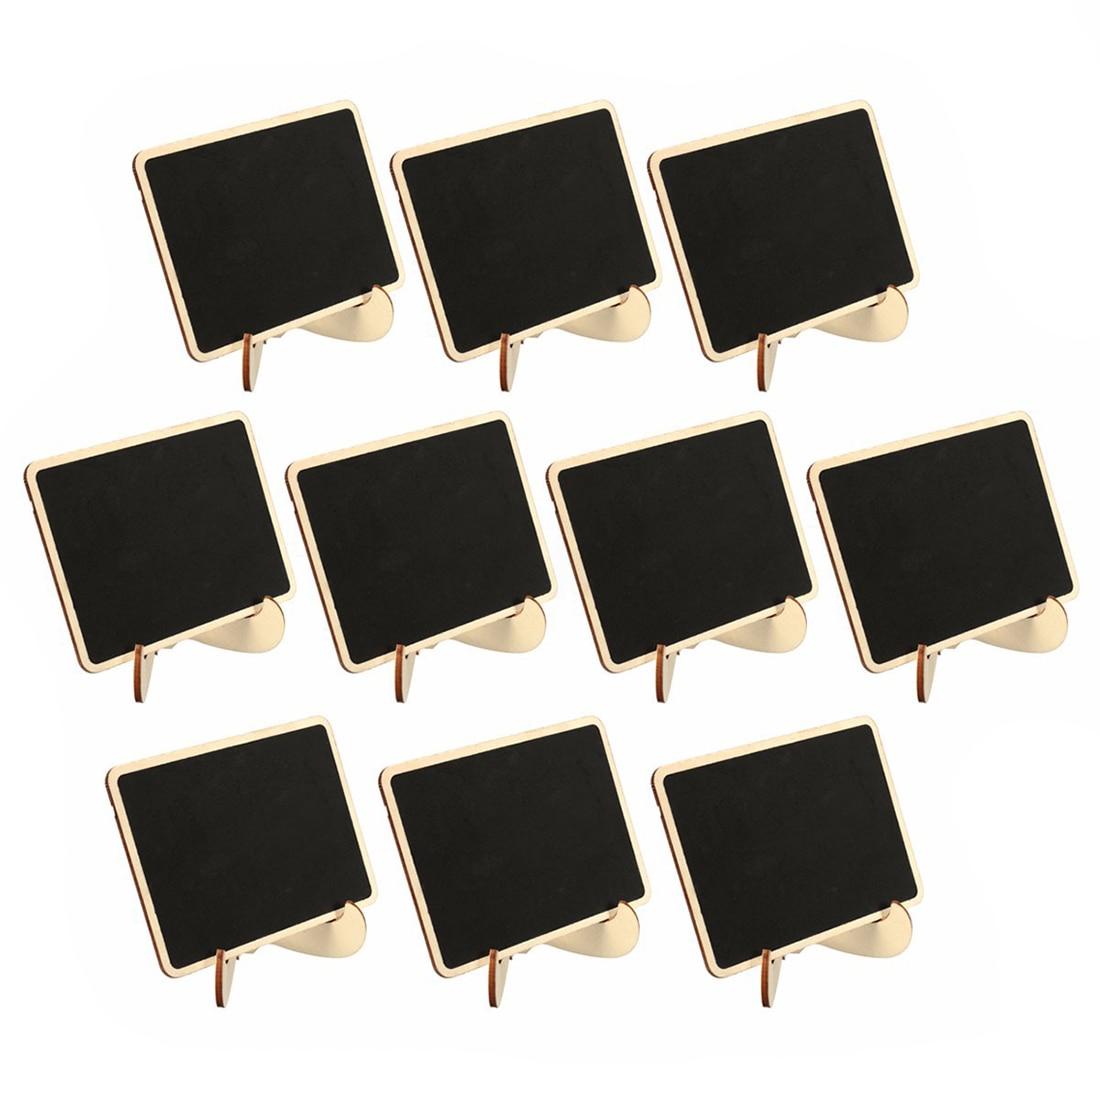 10x Mini Houten Schoolbord Schoolbord Bericht Bruiloft Labels Tafel Decor, zwart + hout kleur